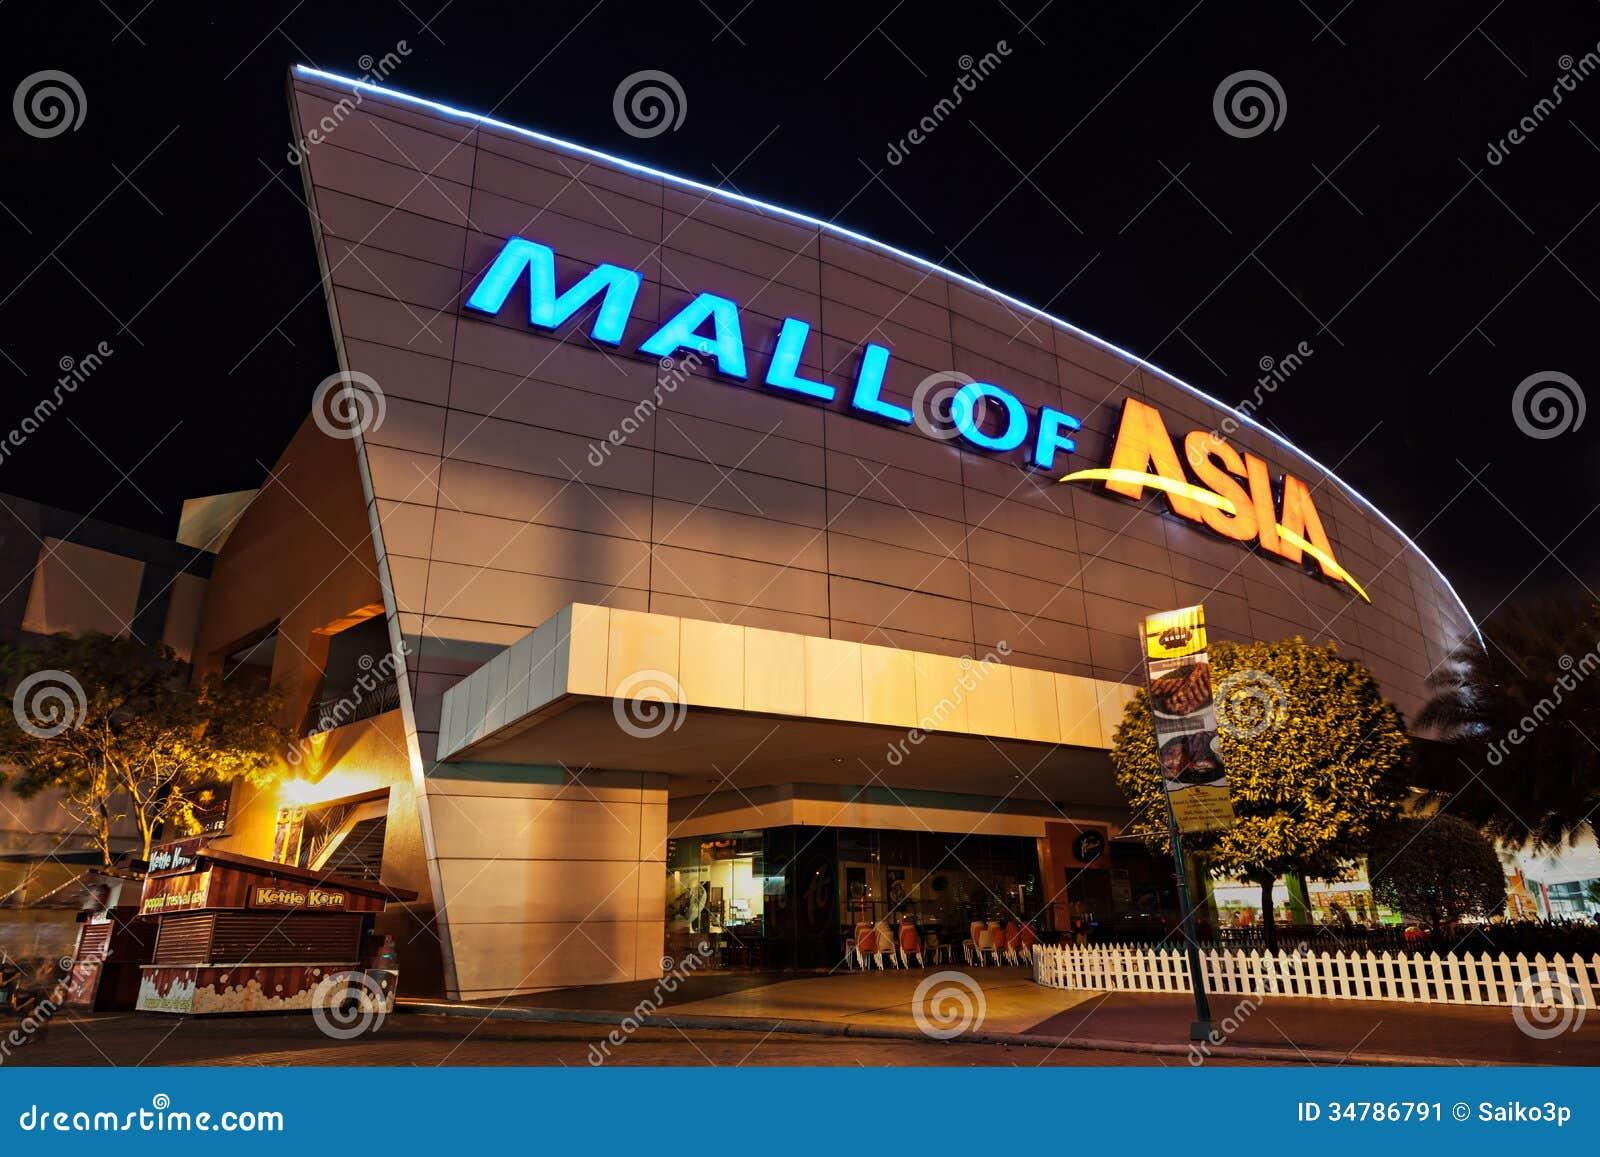 Manila date and time in Australia